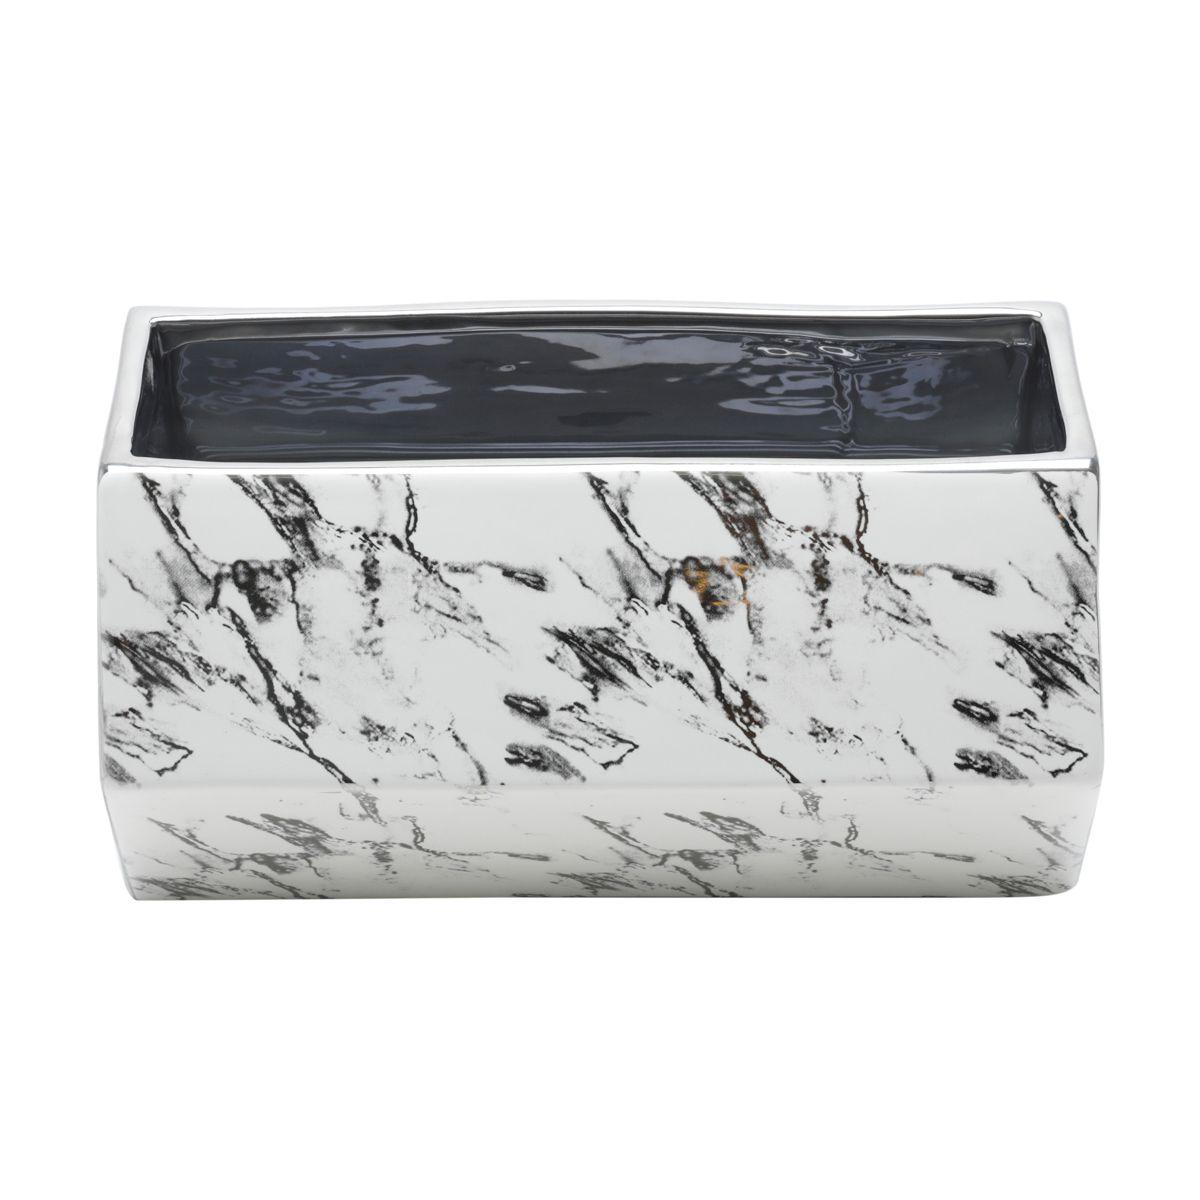 Vaso Branco Marble em Cerâmica 20x13x11cm